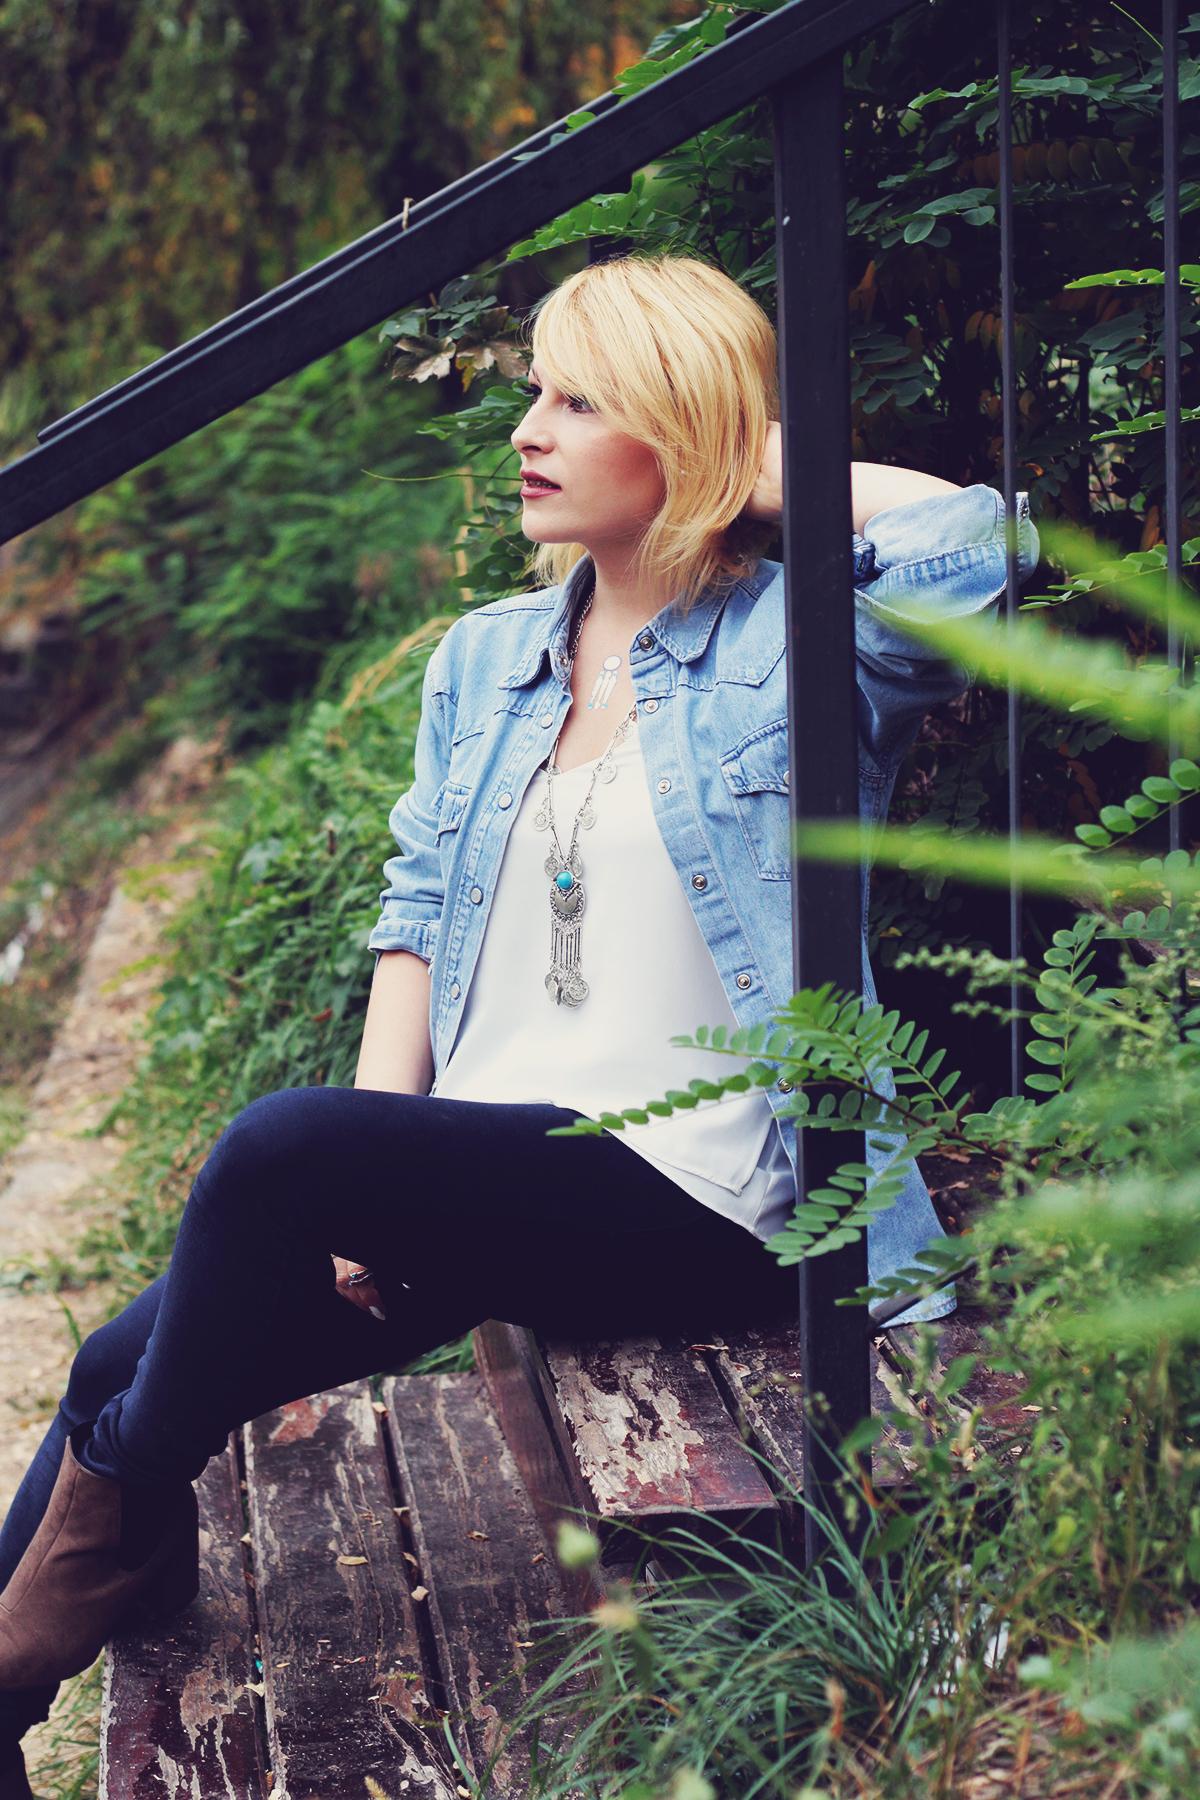 autumn bohemian chic, denim shirt, white top, bohemian necklace, bohemian rings, temporary tattoos, jeans, matte lips, boots